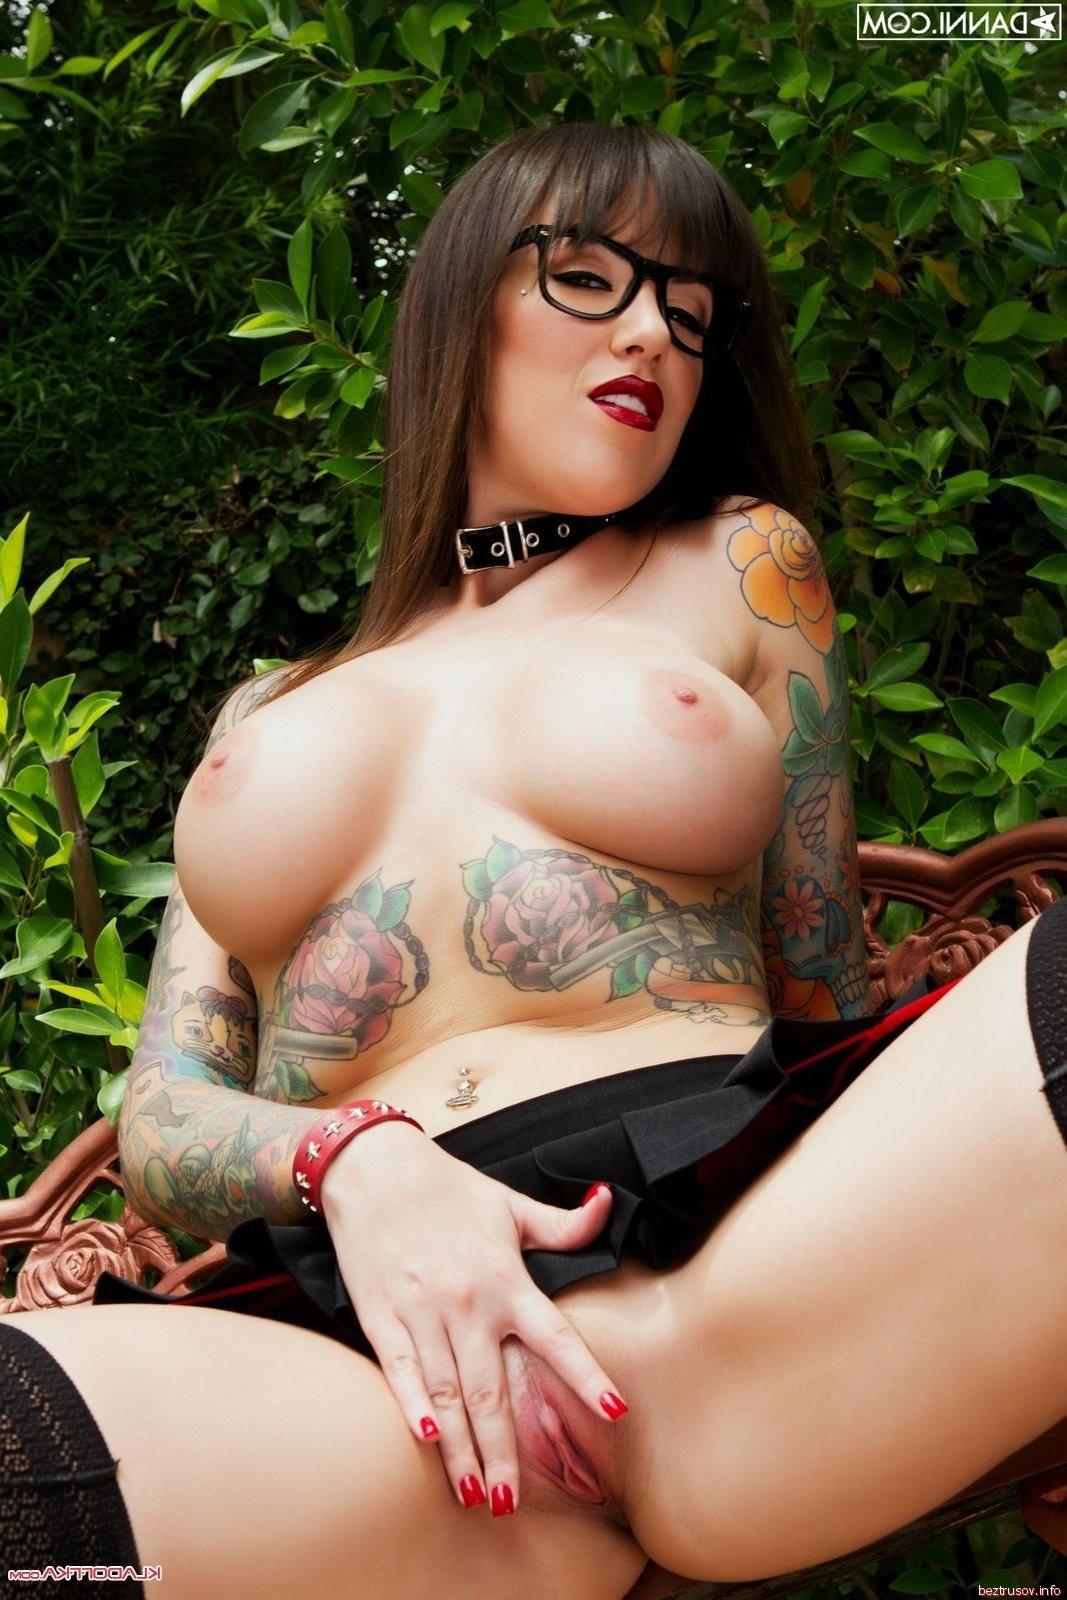 desi blog spot sex clips – Femdom